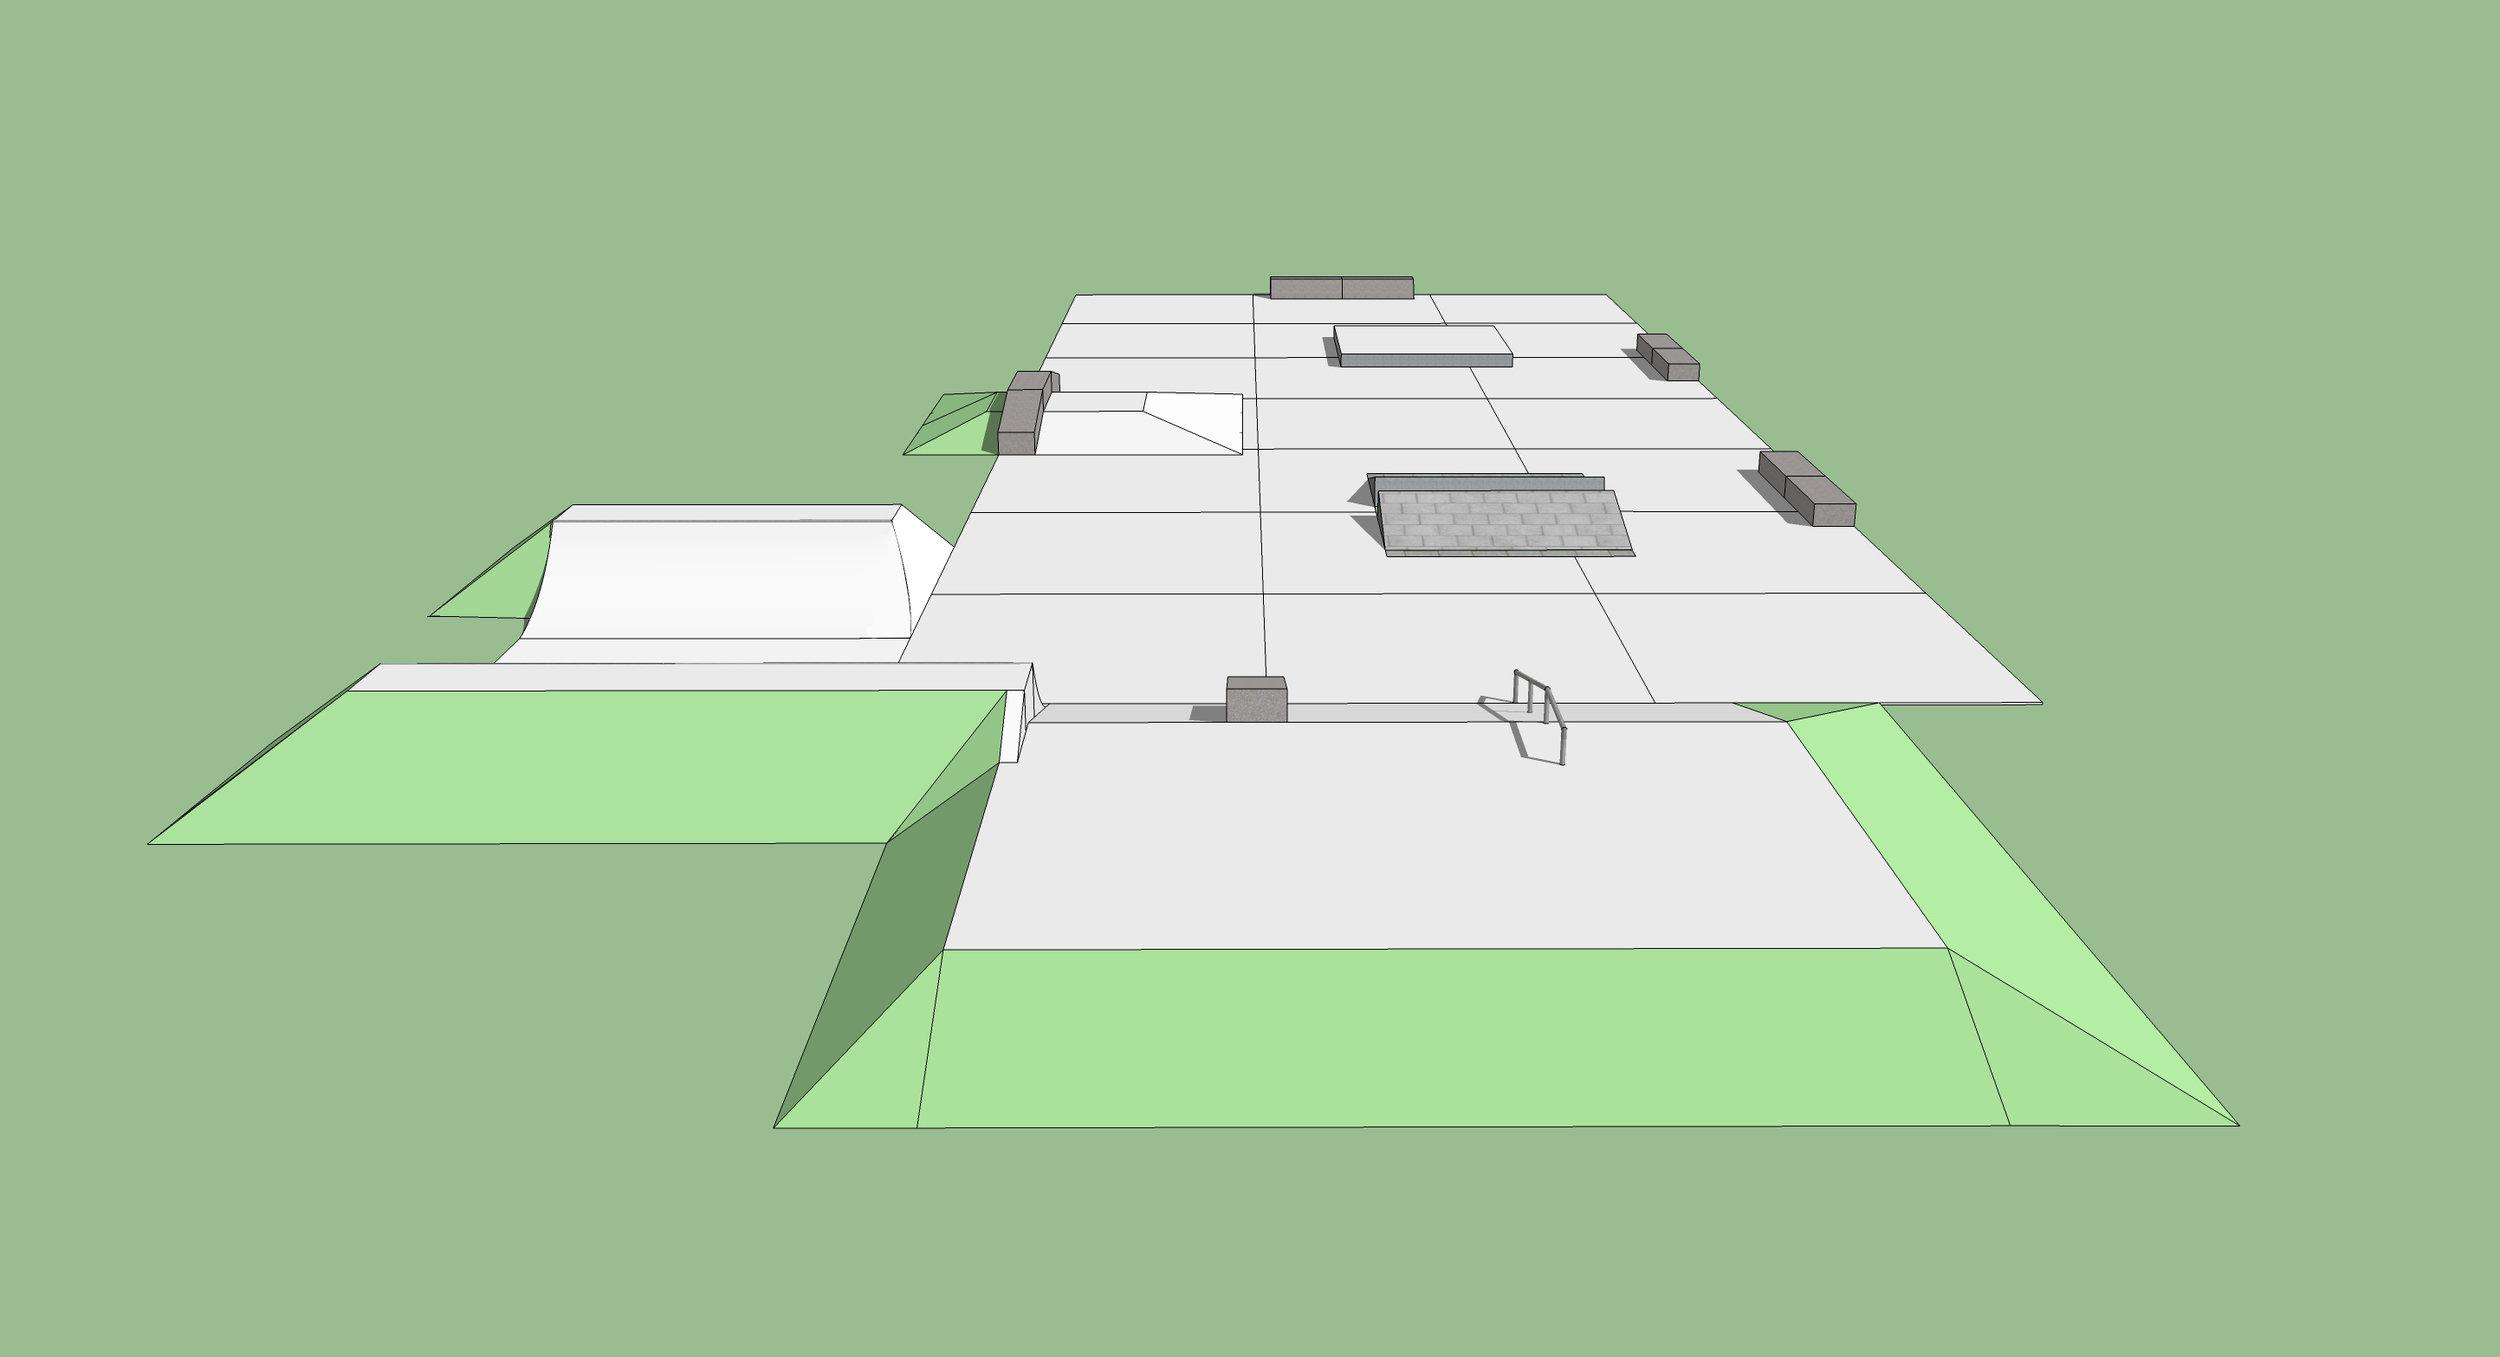 SKATE-ARCHITECTS-NAVARCLES-Skateplaza-Arquitectura-161215-notrees-23.jpg